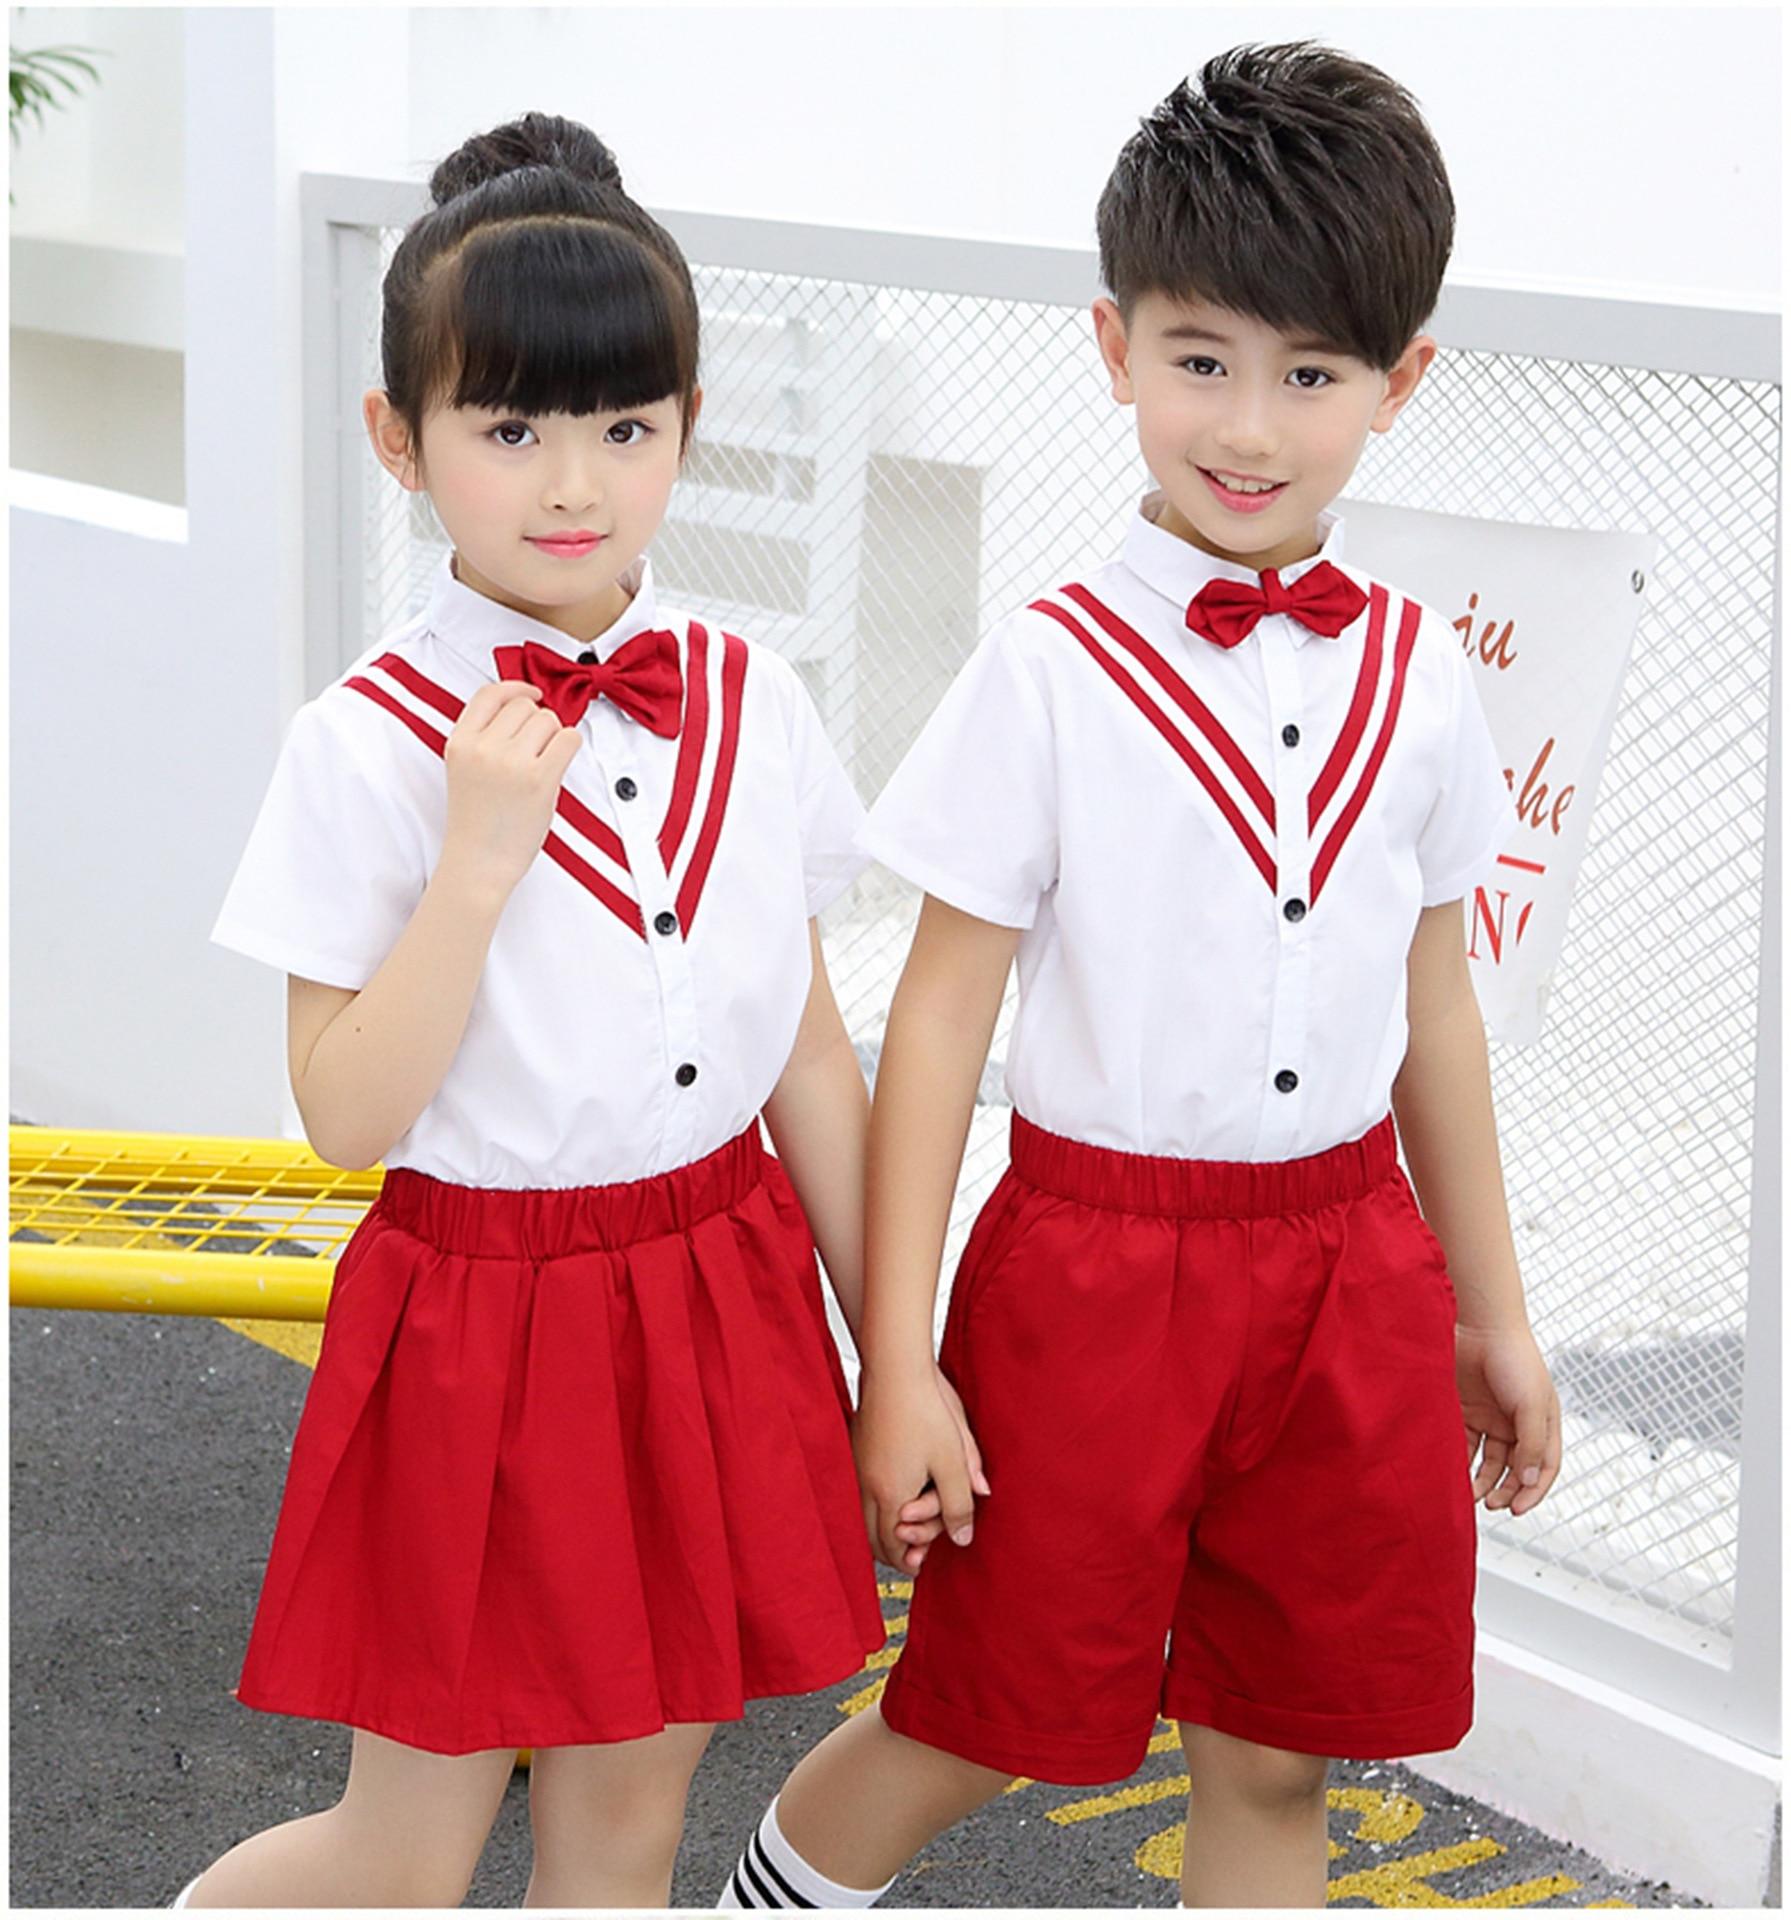 School Uniforms For Girls  And Boys Children's Performance Dress Graduation Dress Dropshipping